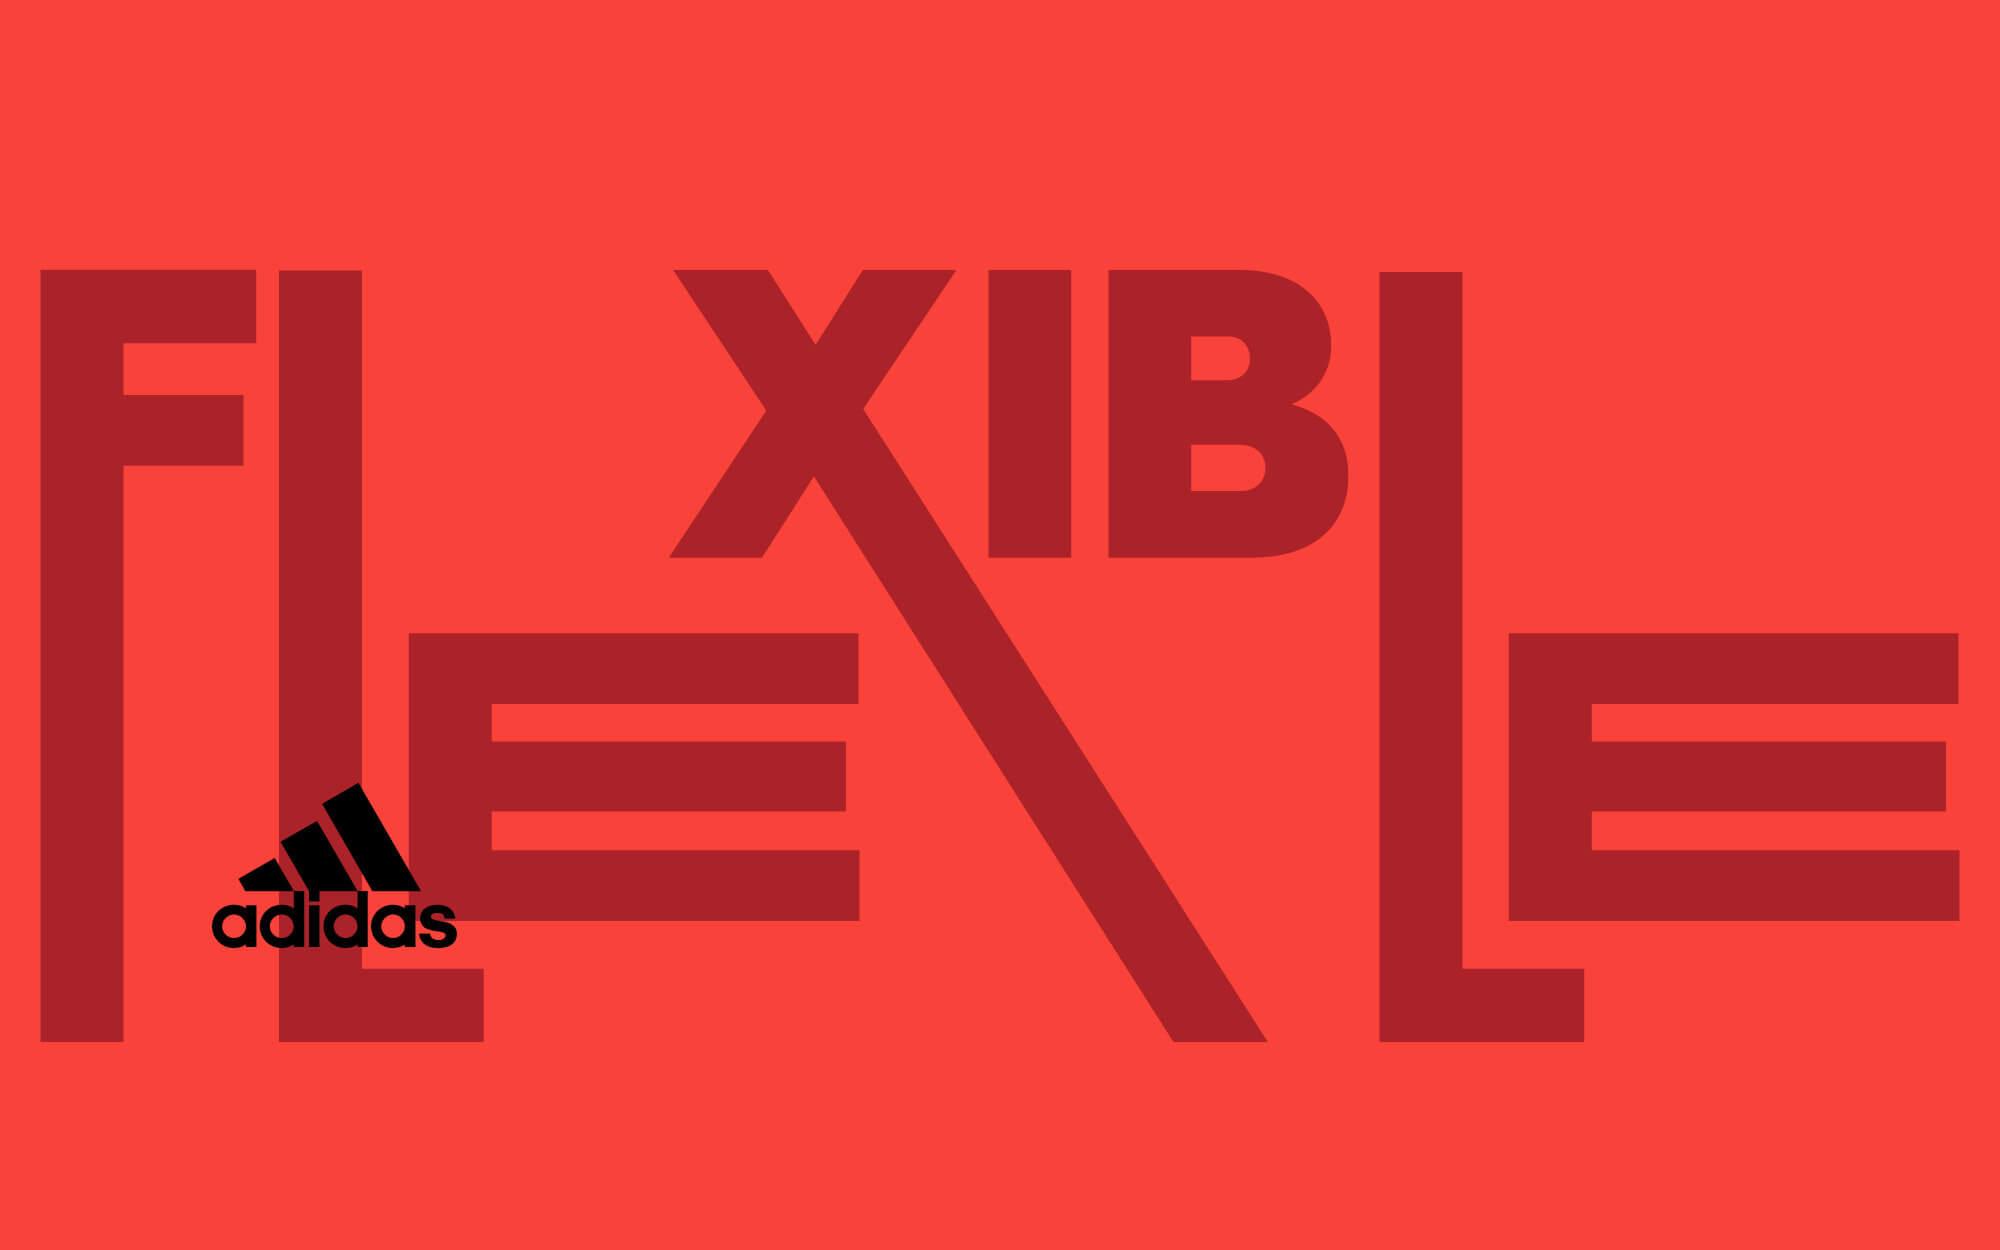 EIGA_adidas_TypeExploration_L_28